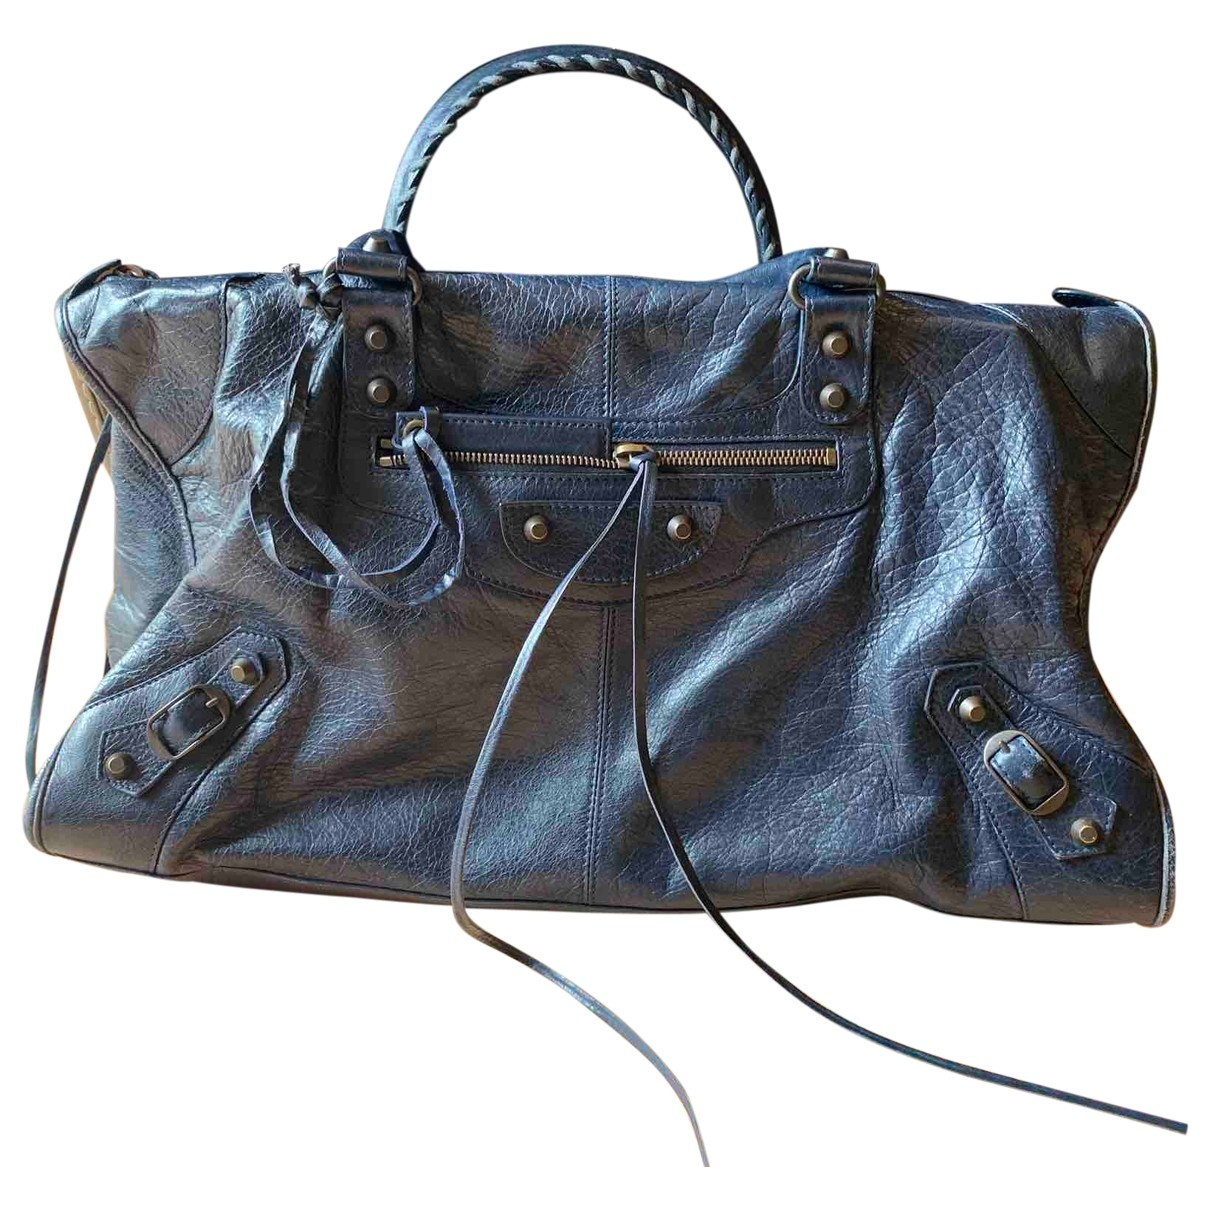 Balenciaga City Handtasche in  Blau Leder